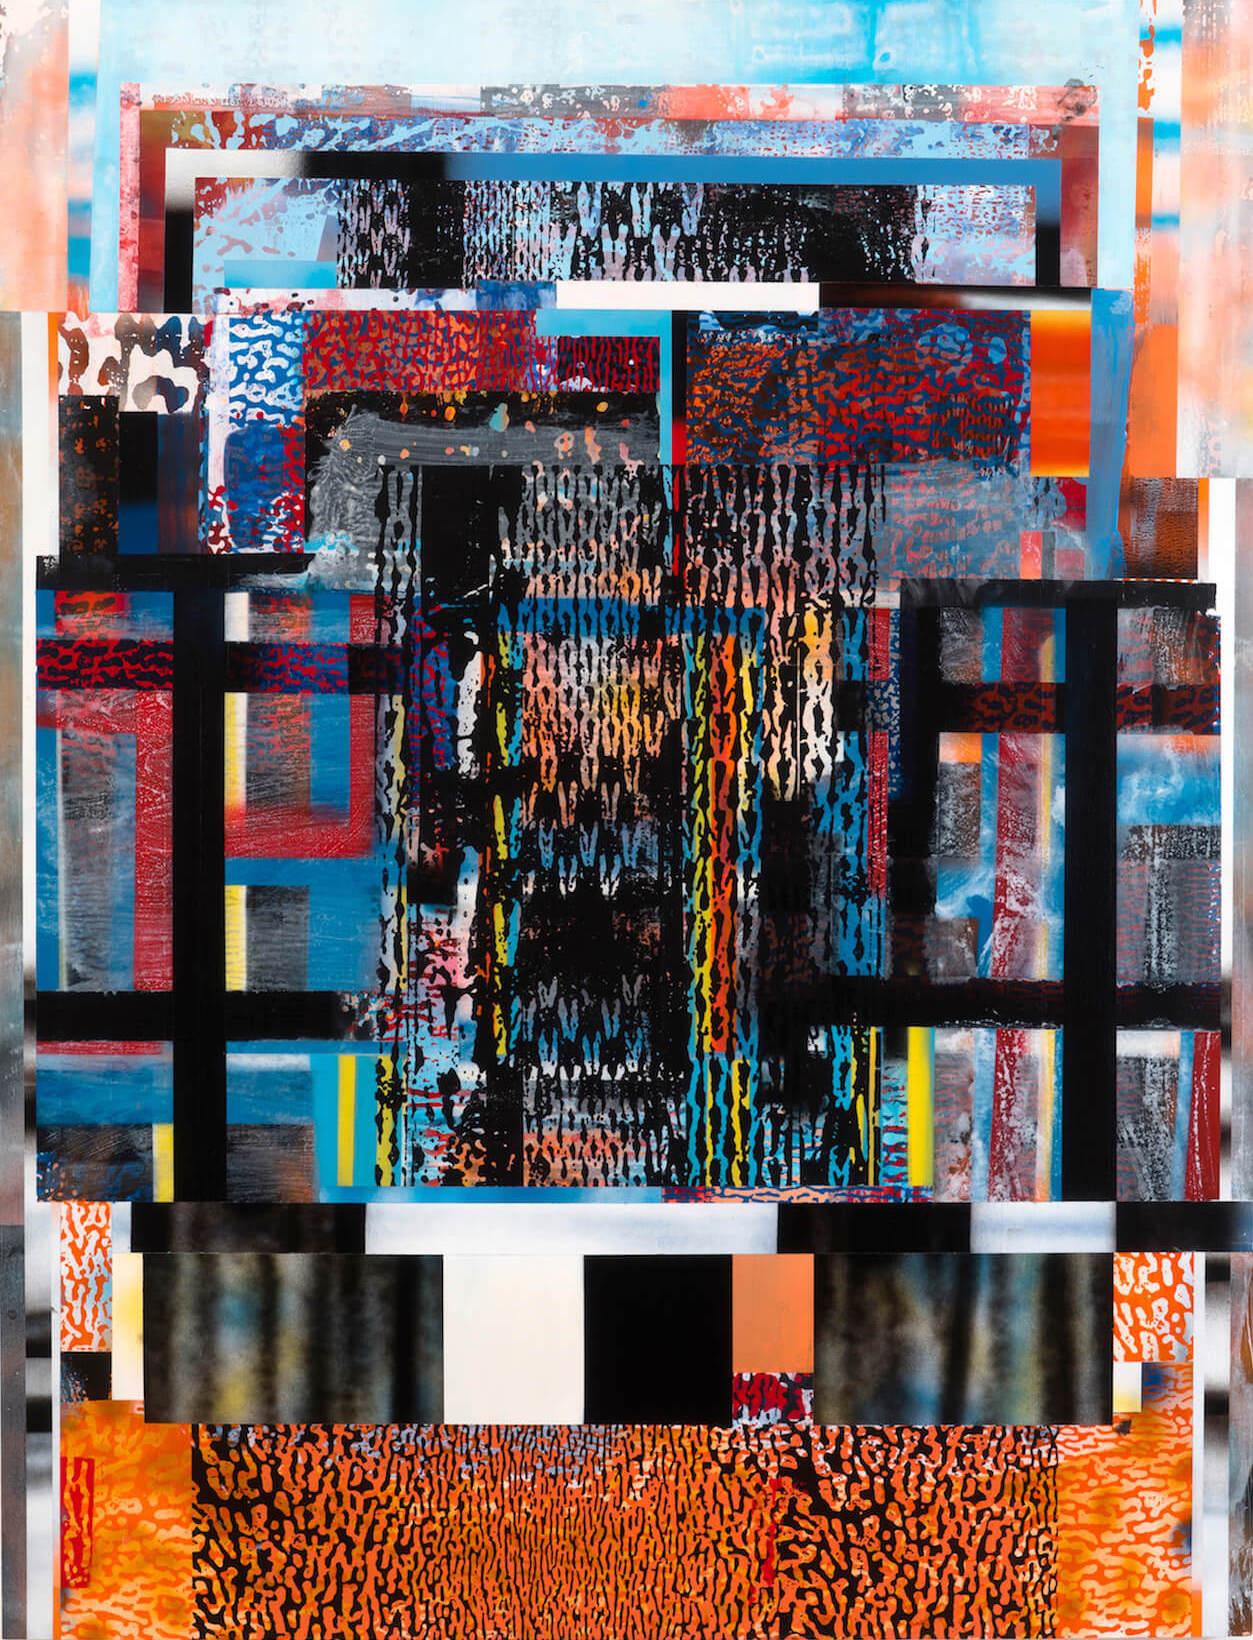 Patrick Berran, Untitled, 2017, acrylic and toner on panel, 60 x 46 inches (courtesy of Chapter NY)